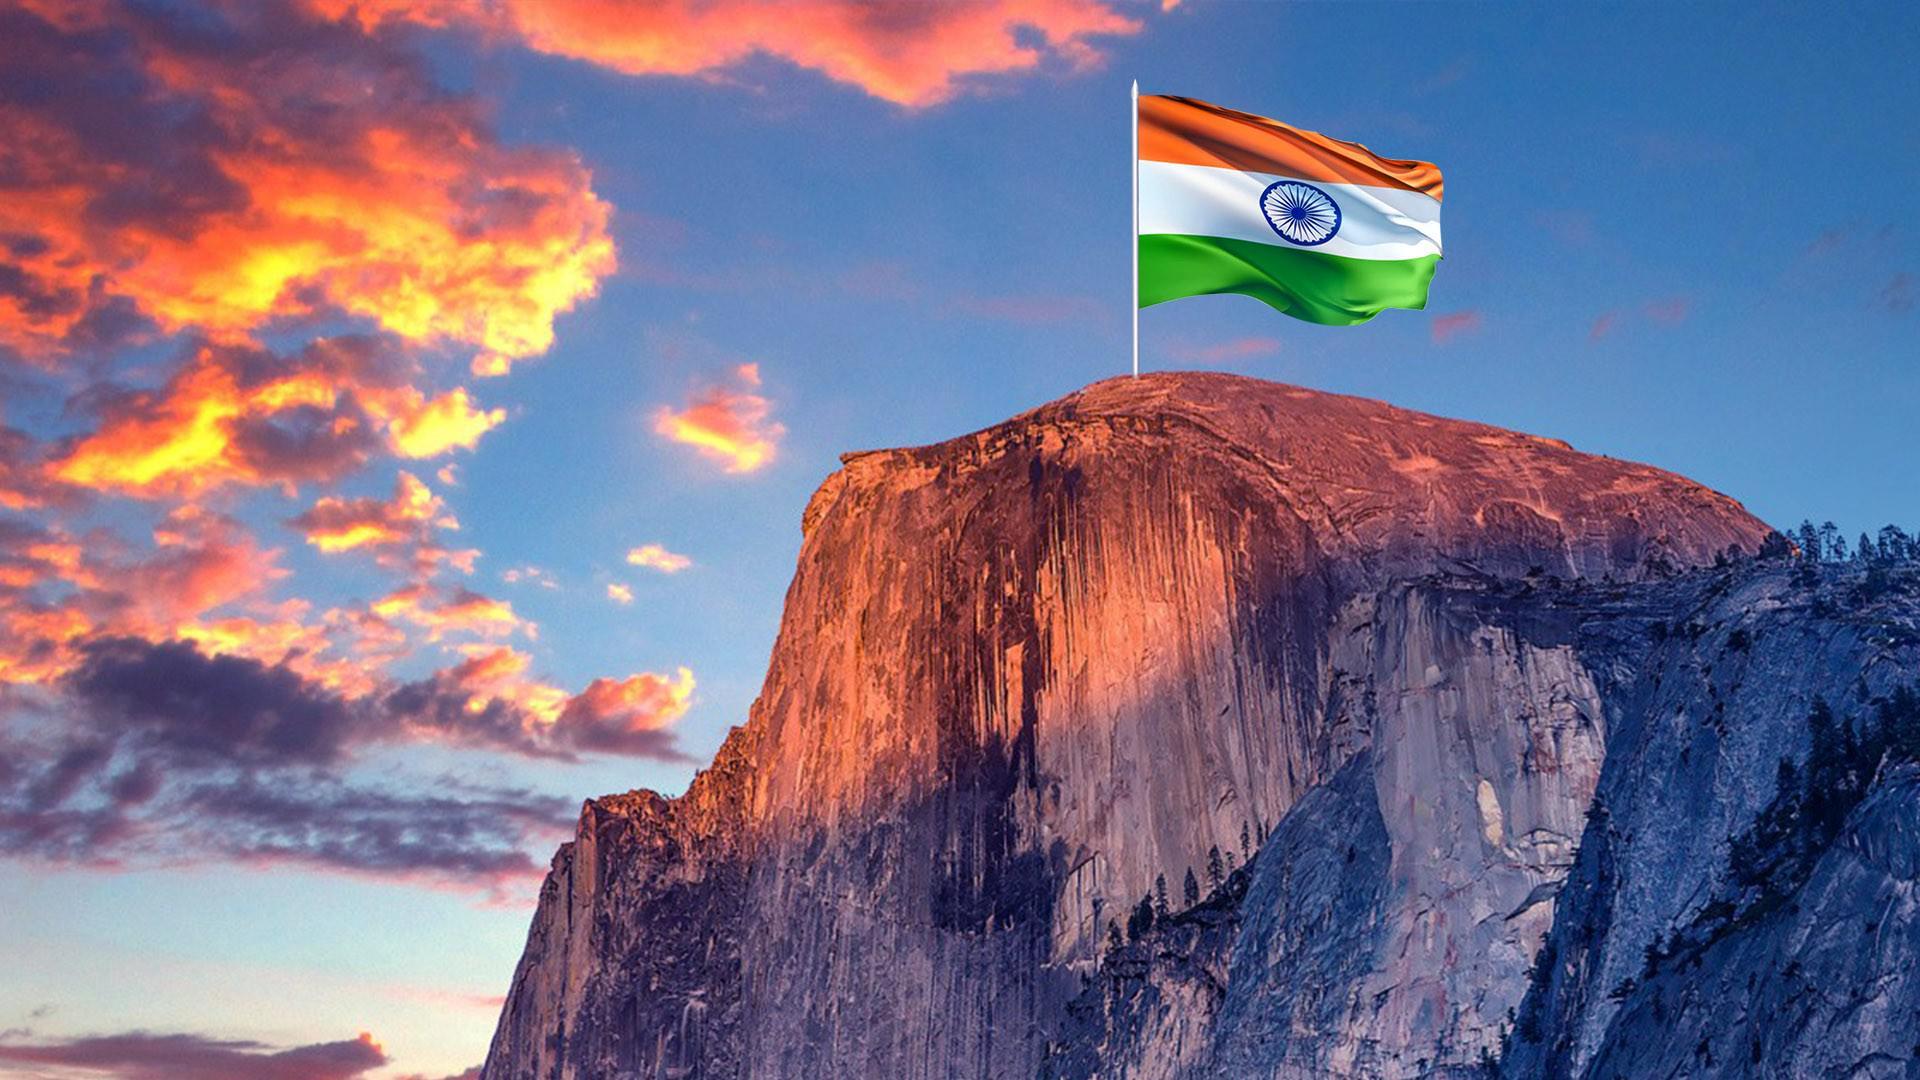 Indian Old Flag Hd Wallpapers Wallpaperss Hd Desktop